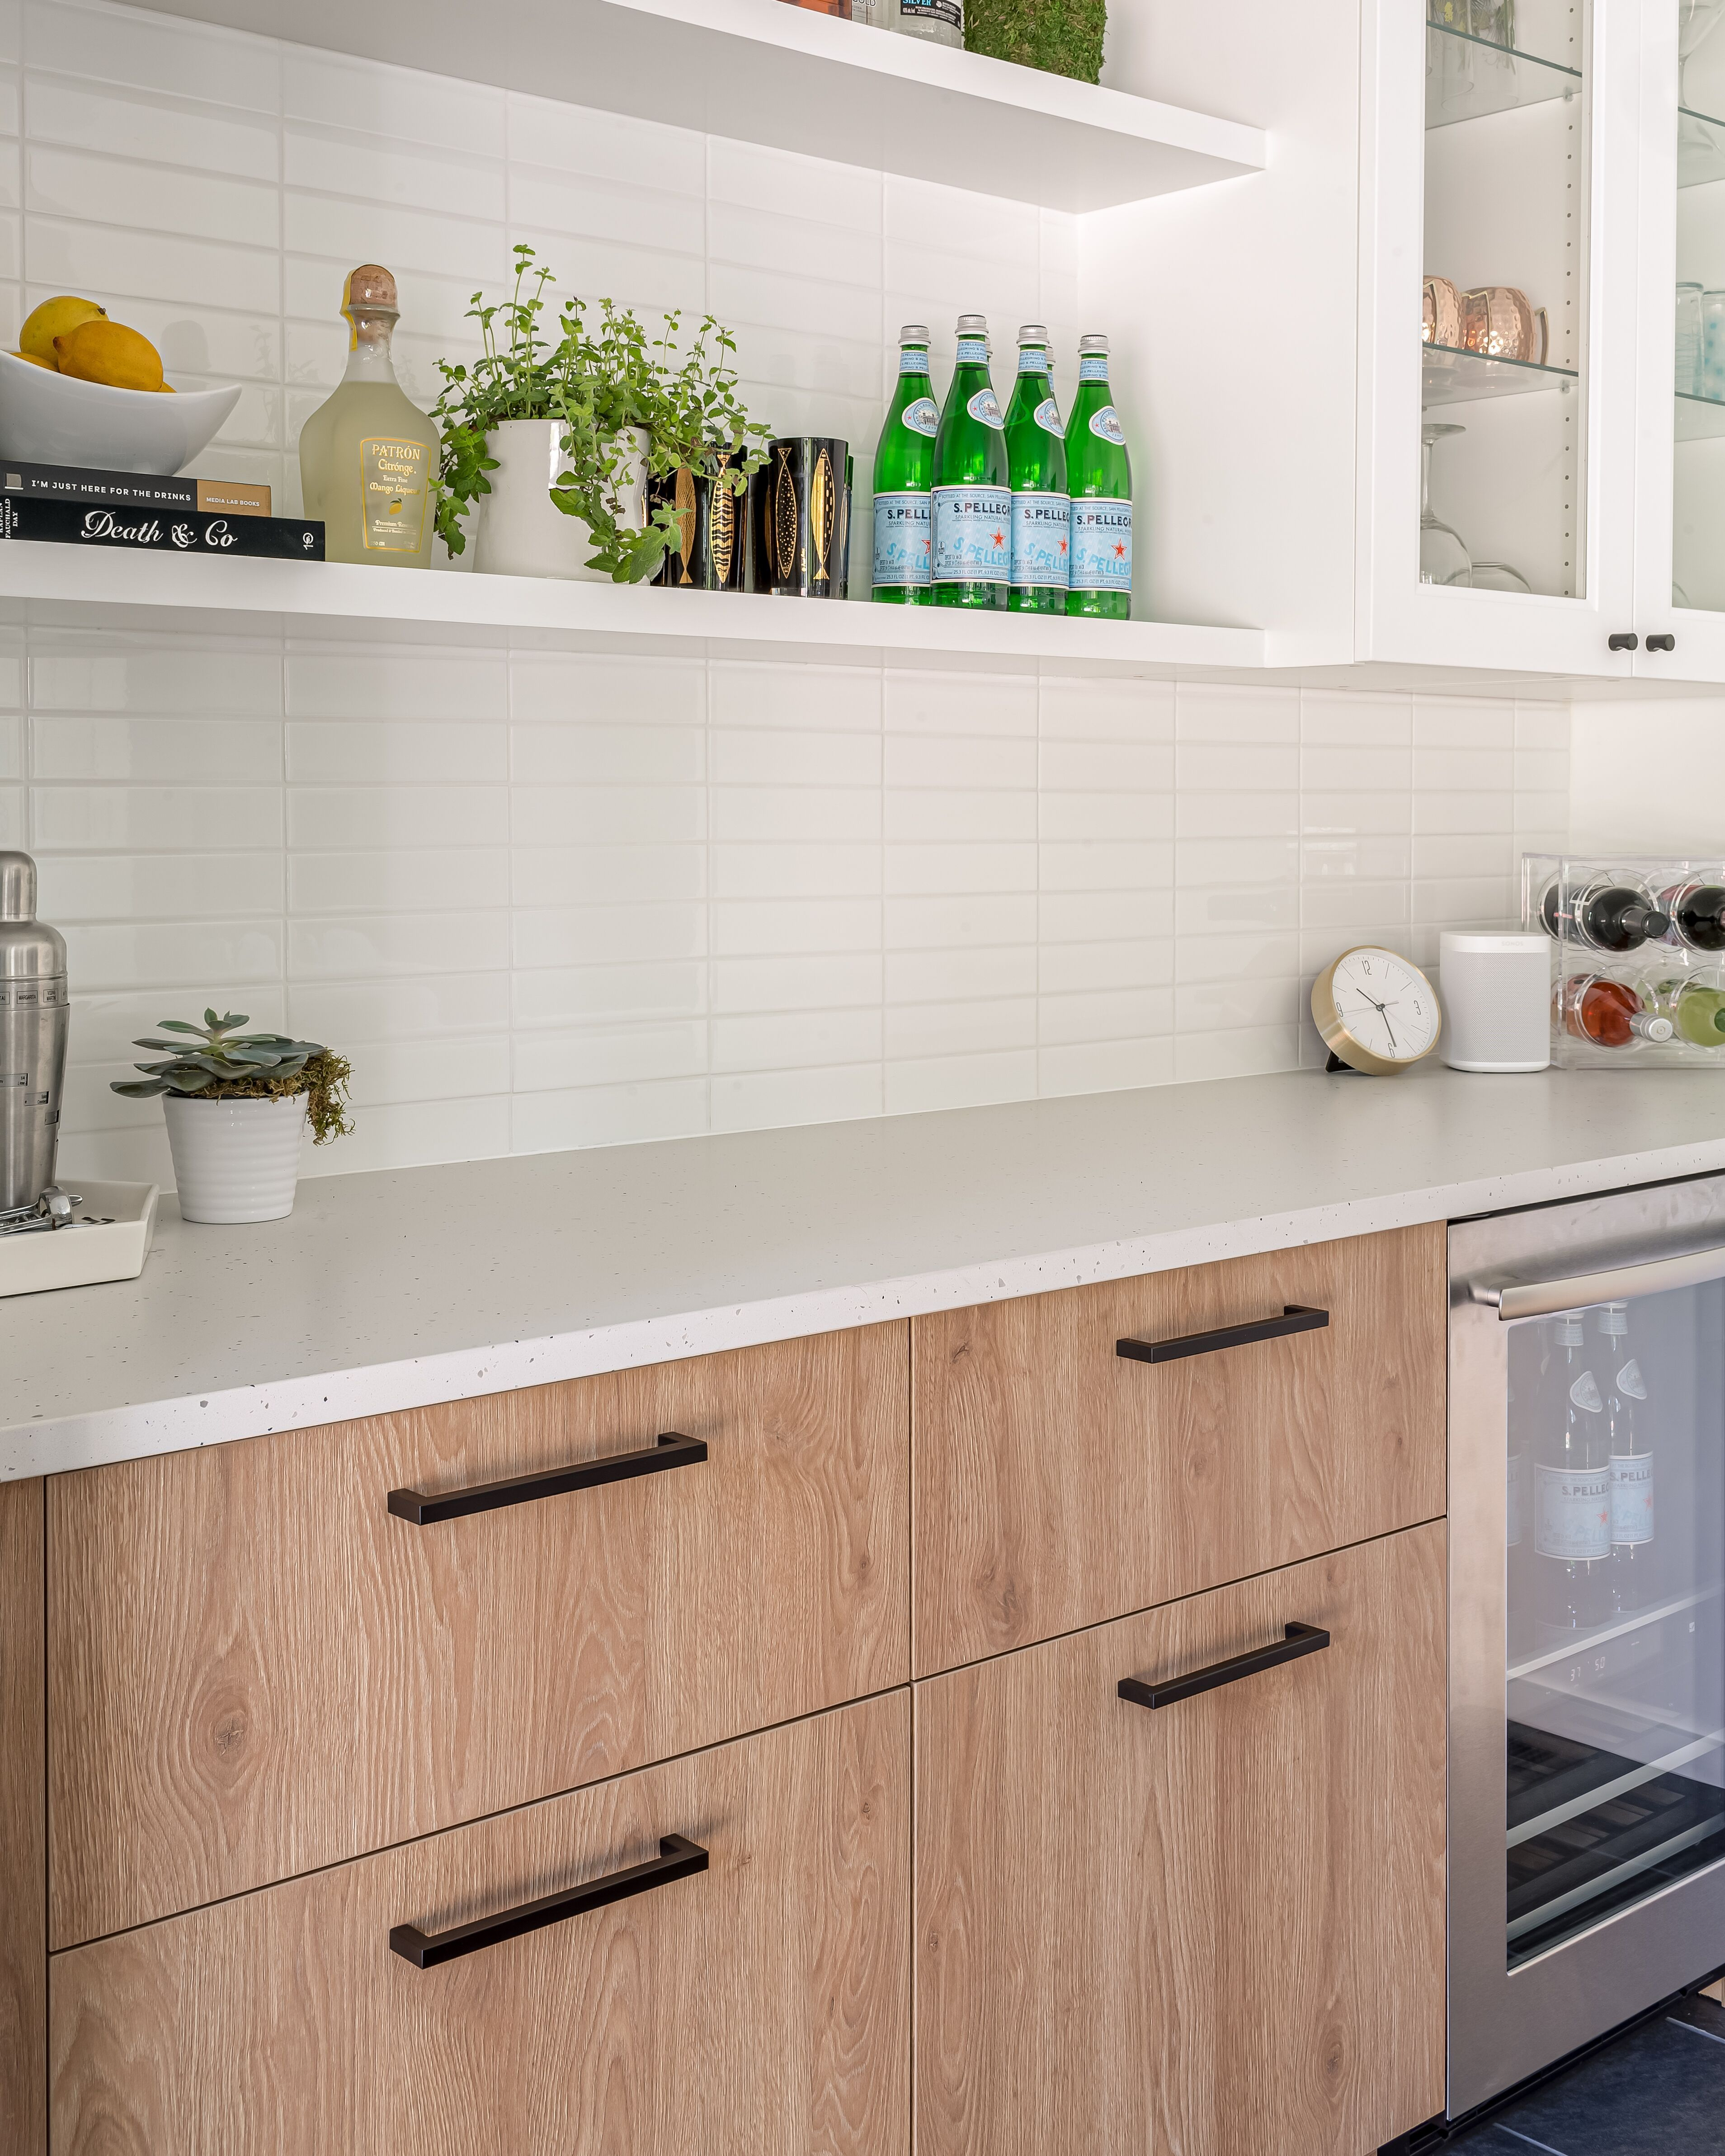 Scandinavian Kitchen Cabinet Hardware In 2020 Scandinavian Kitchen Cabinets Custom Kitchen Cabinets Scandinavian Kitchen